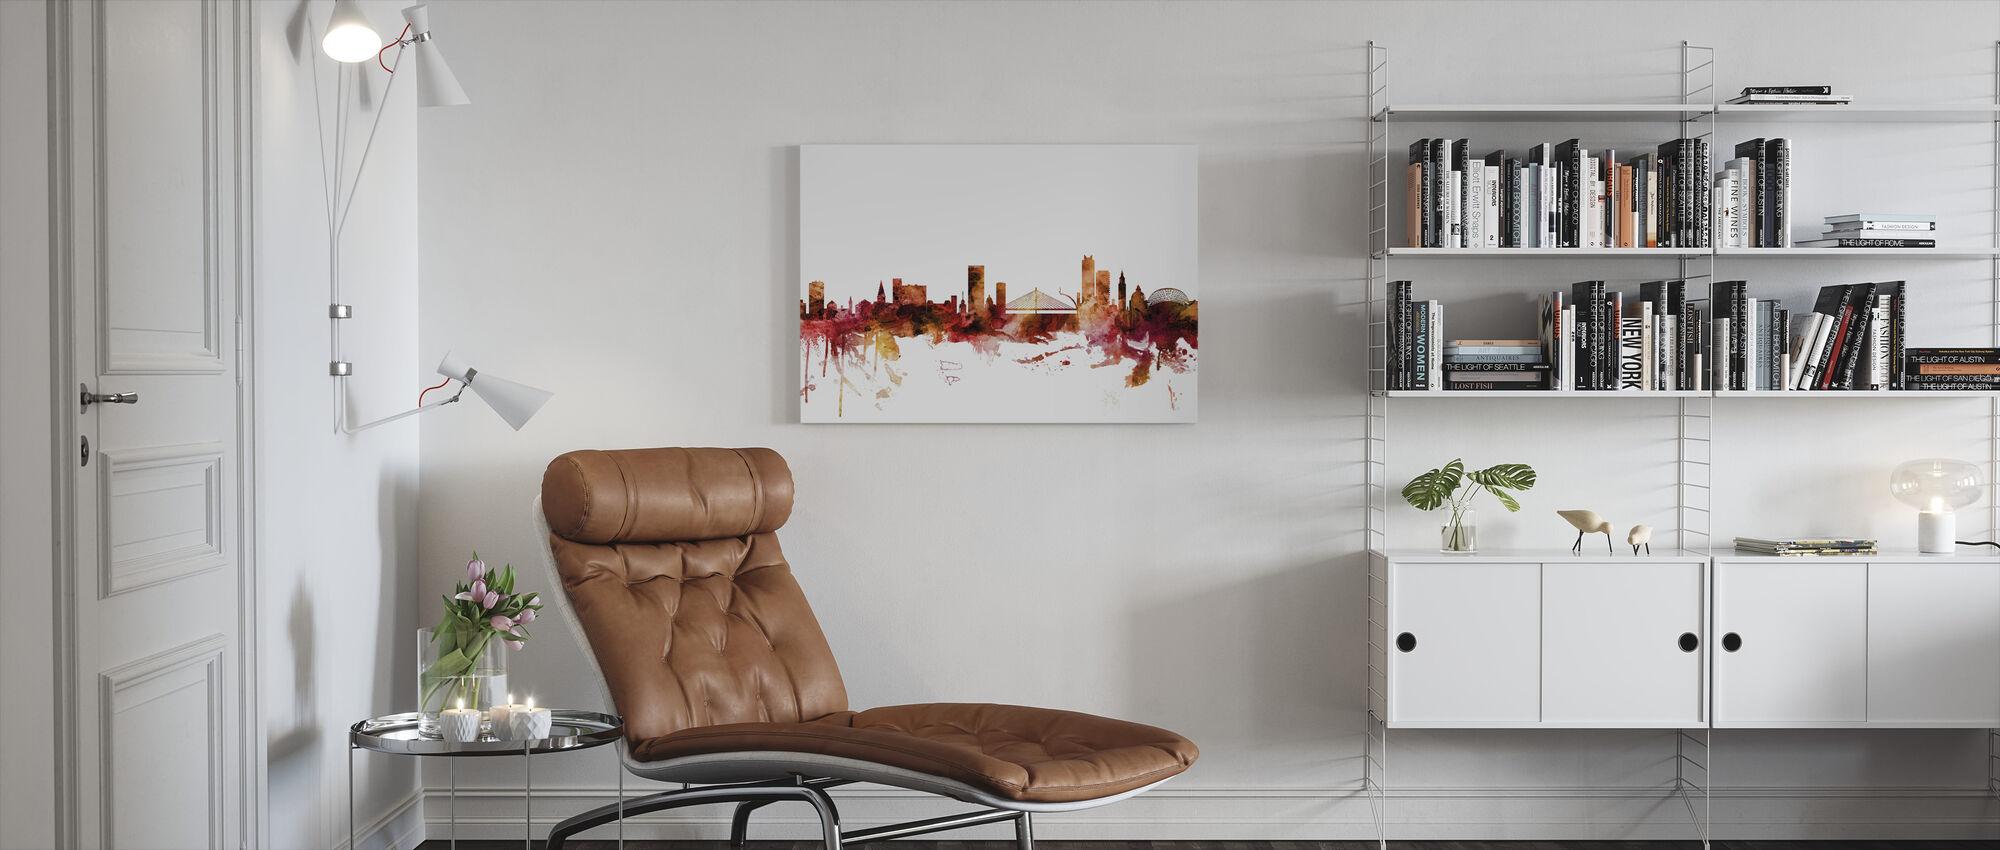 Liege Belgium Skyline - Canvas print - Living Room